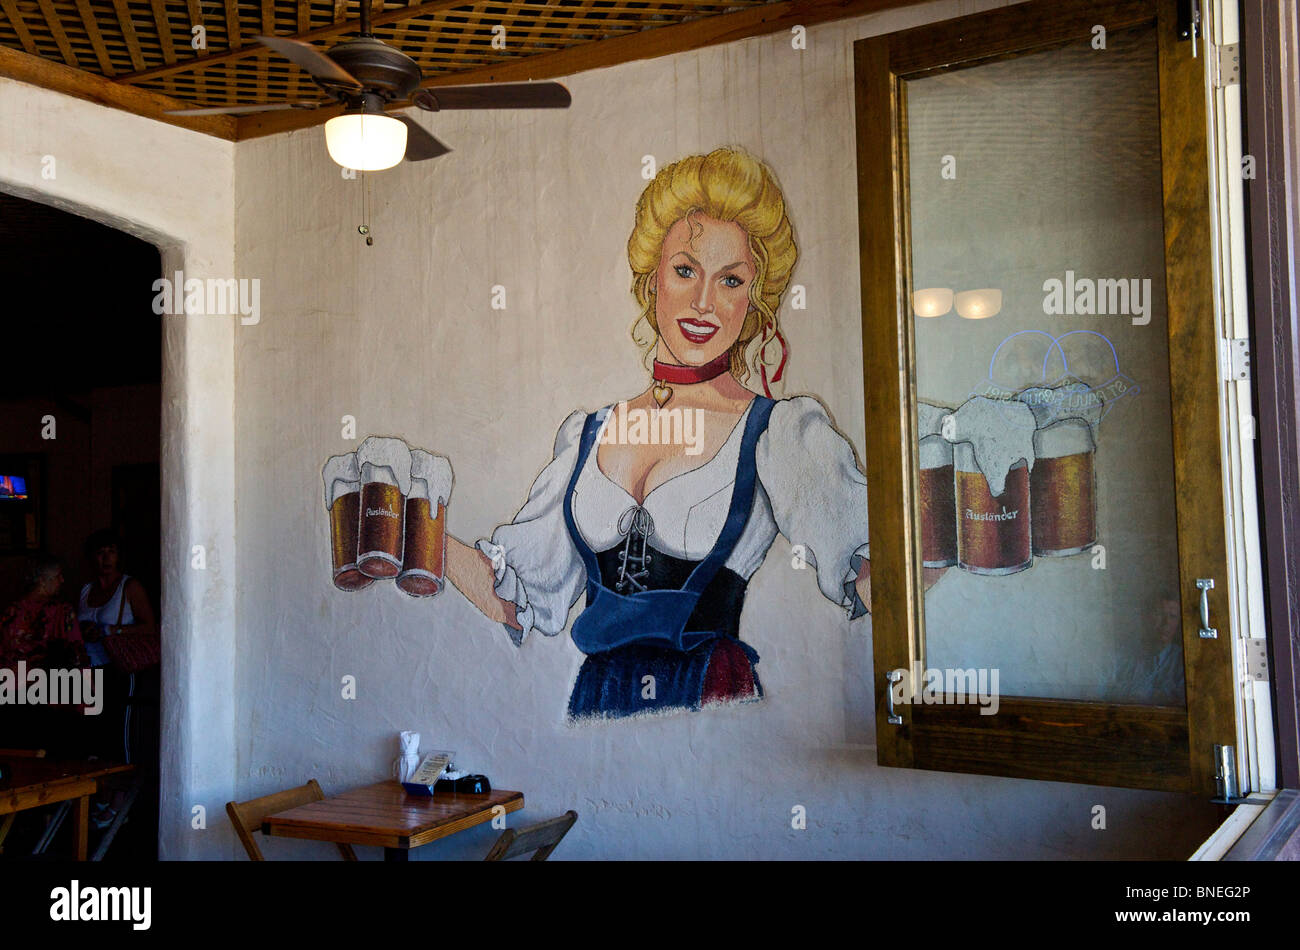 Auslander Restaurant Biergarten et Hill Country Fredericksburg, au Texas, USA Banque D'Images